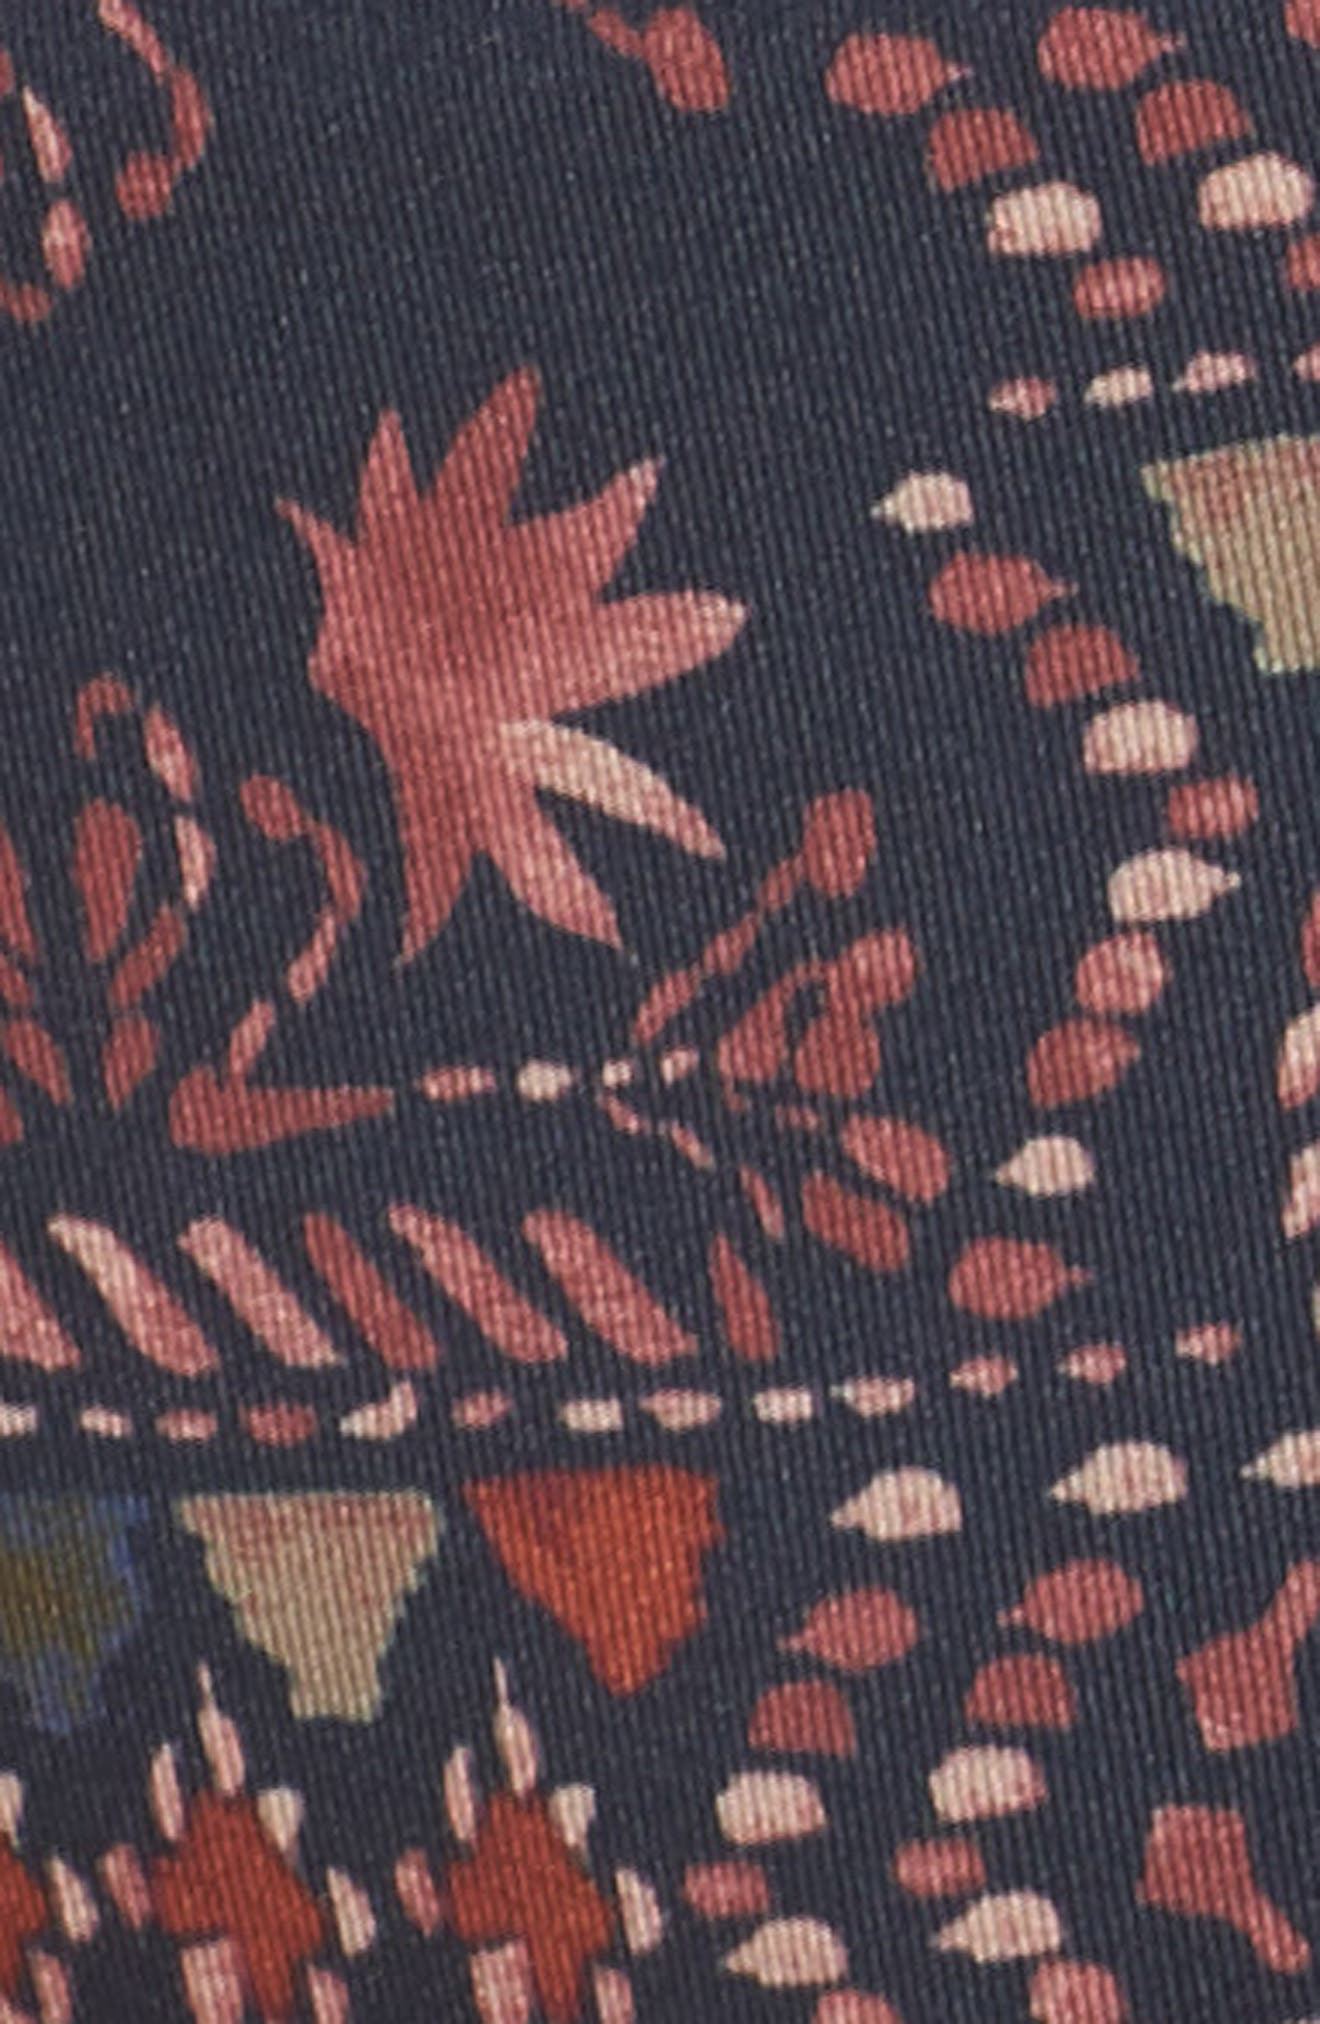 Sunamee Bikini Bottoms,                             Alternate thumbnail 5, color,                             FIRESIDE: NAVY BLUE